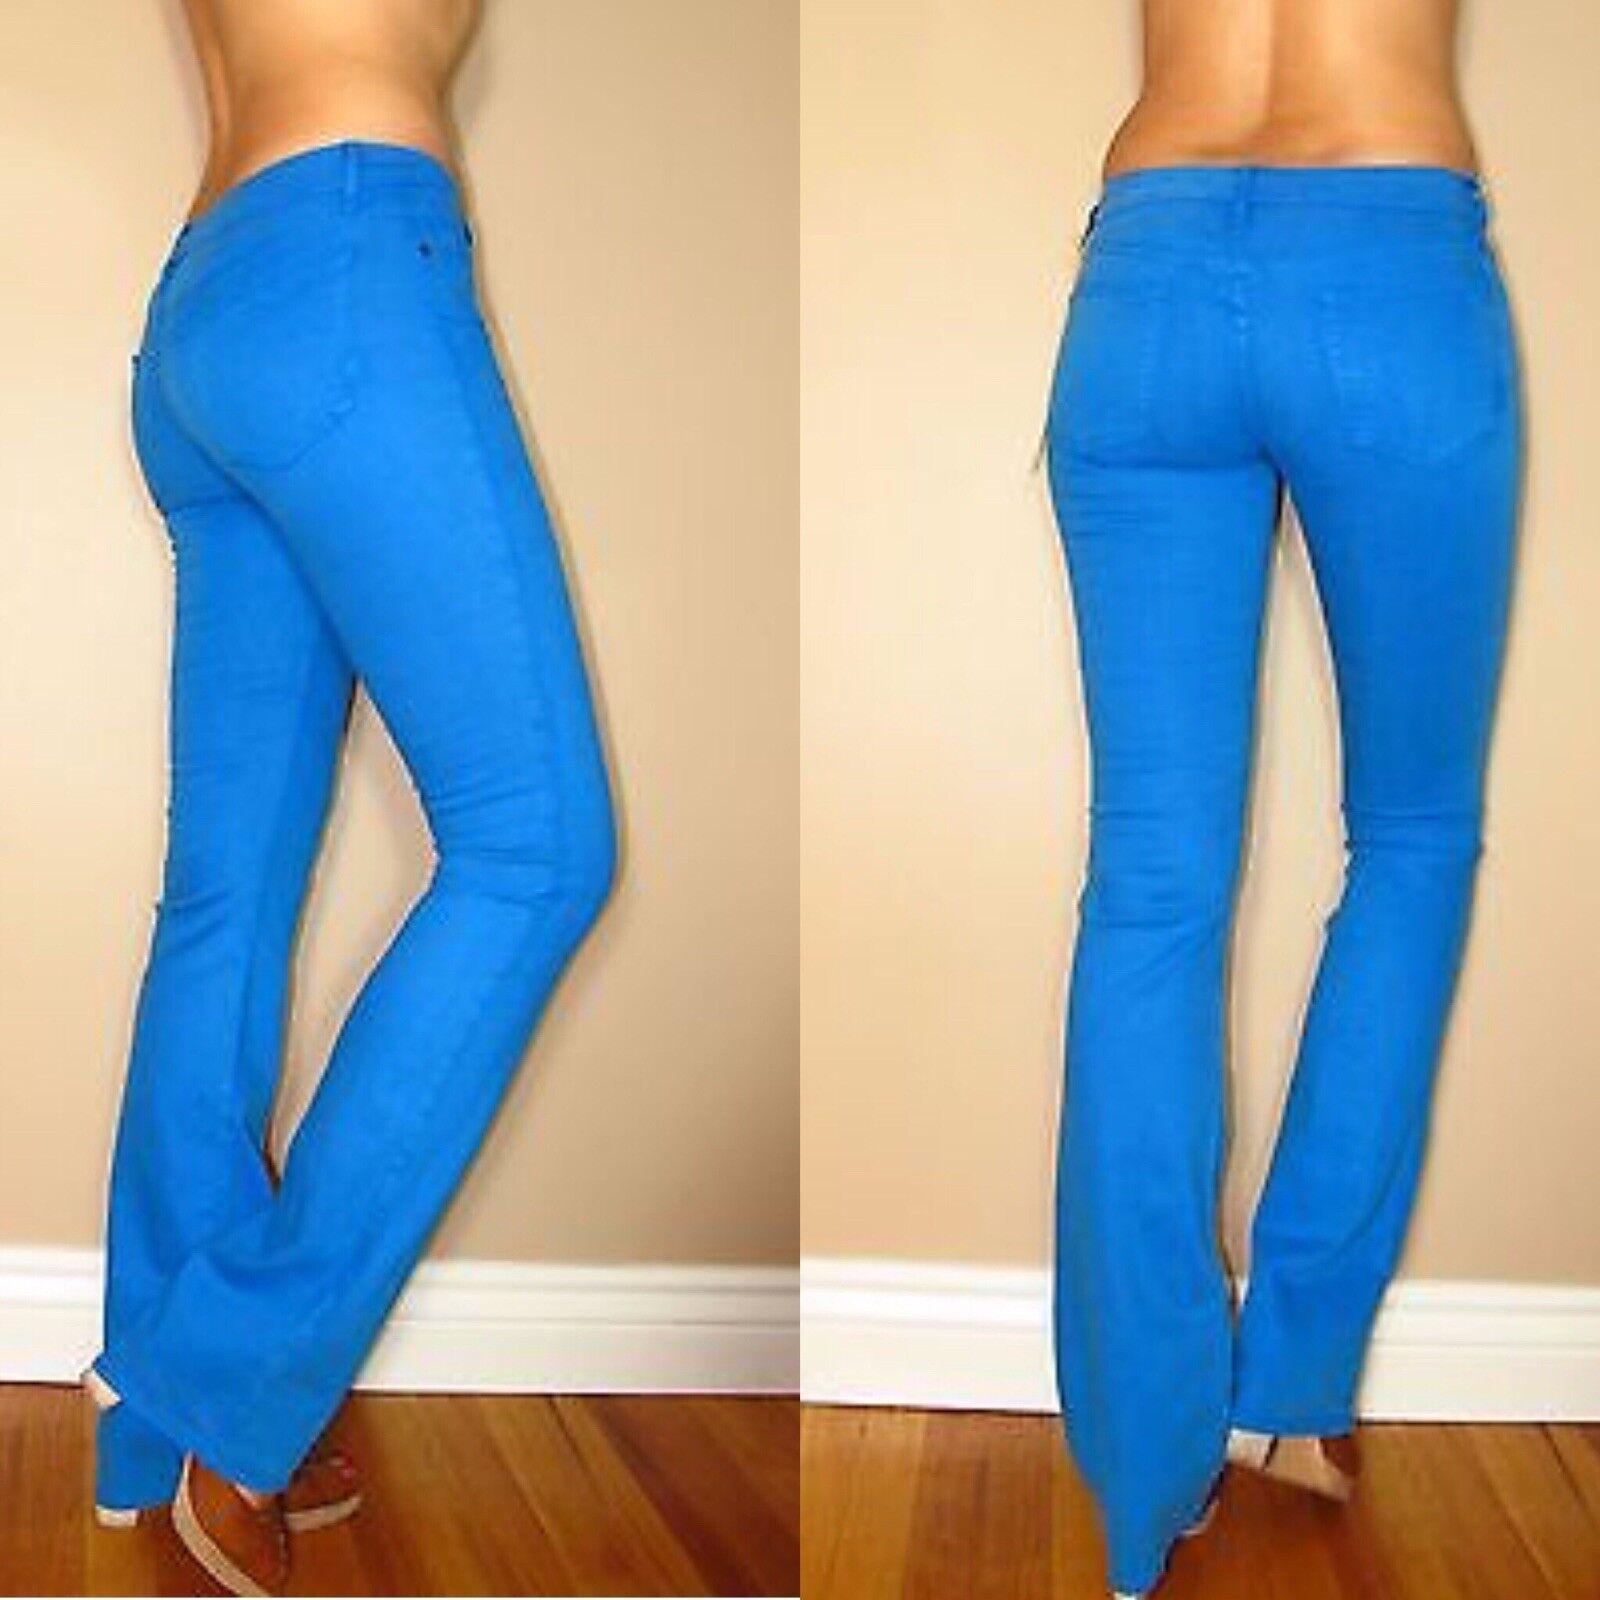 165 Rich & Skinny Bright Blau Sarcelle Coul Slim Stiefel STRAIGHT jeans X-Long 26 Neuf avec étiquettes